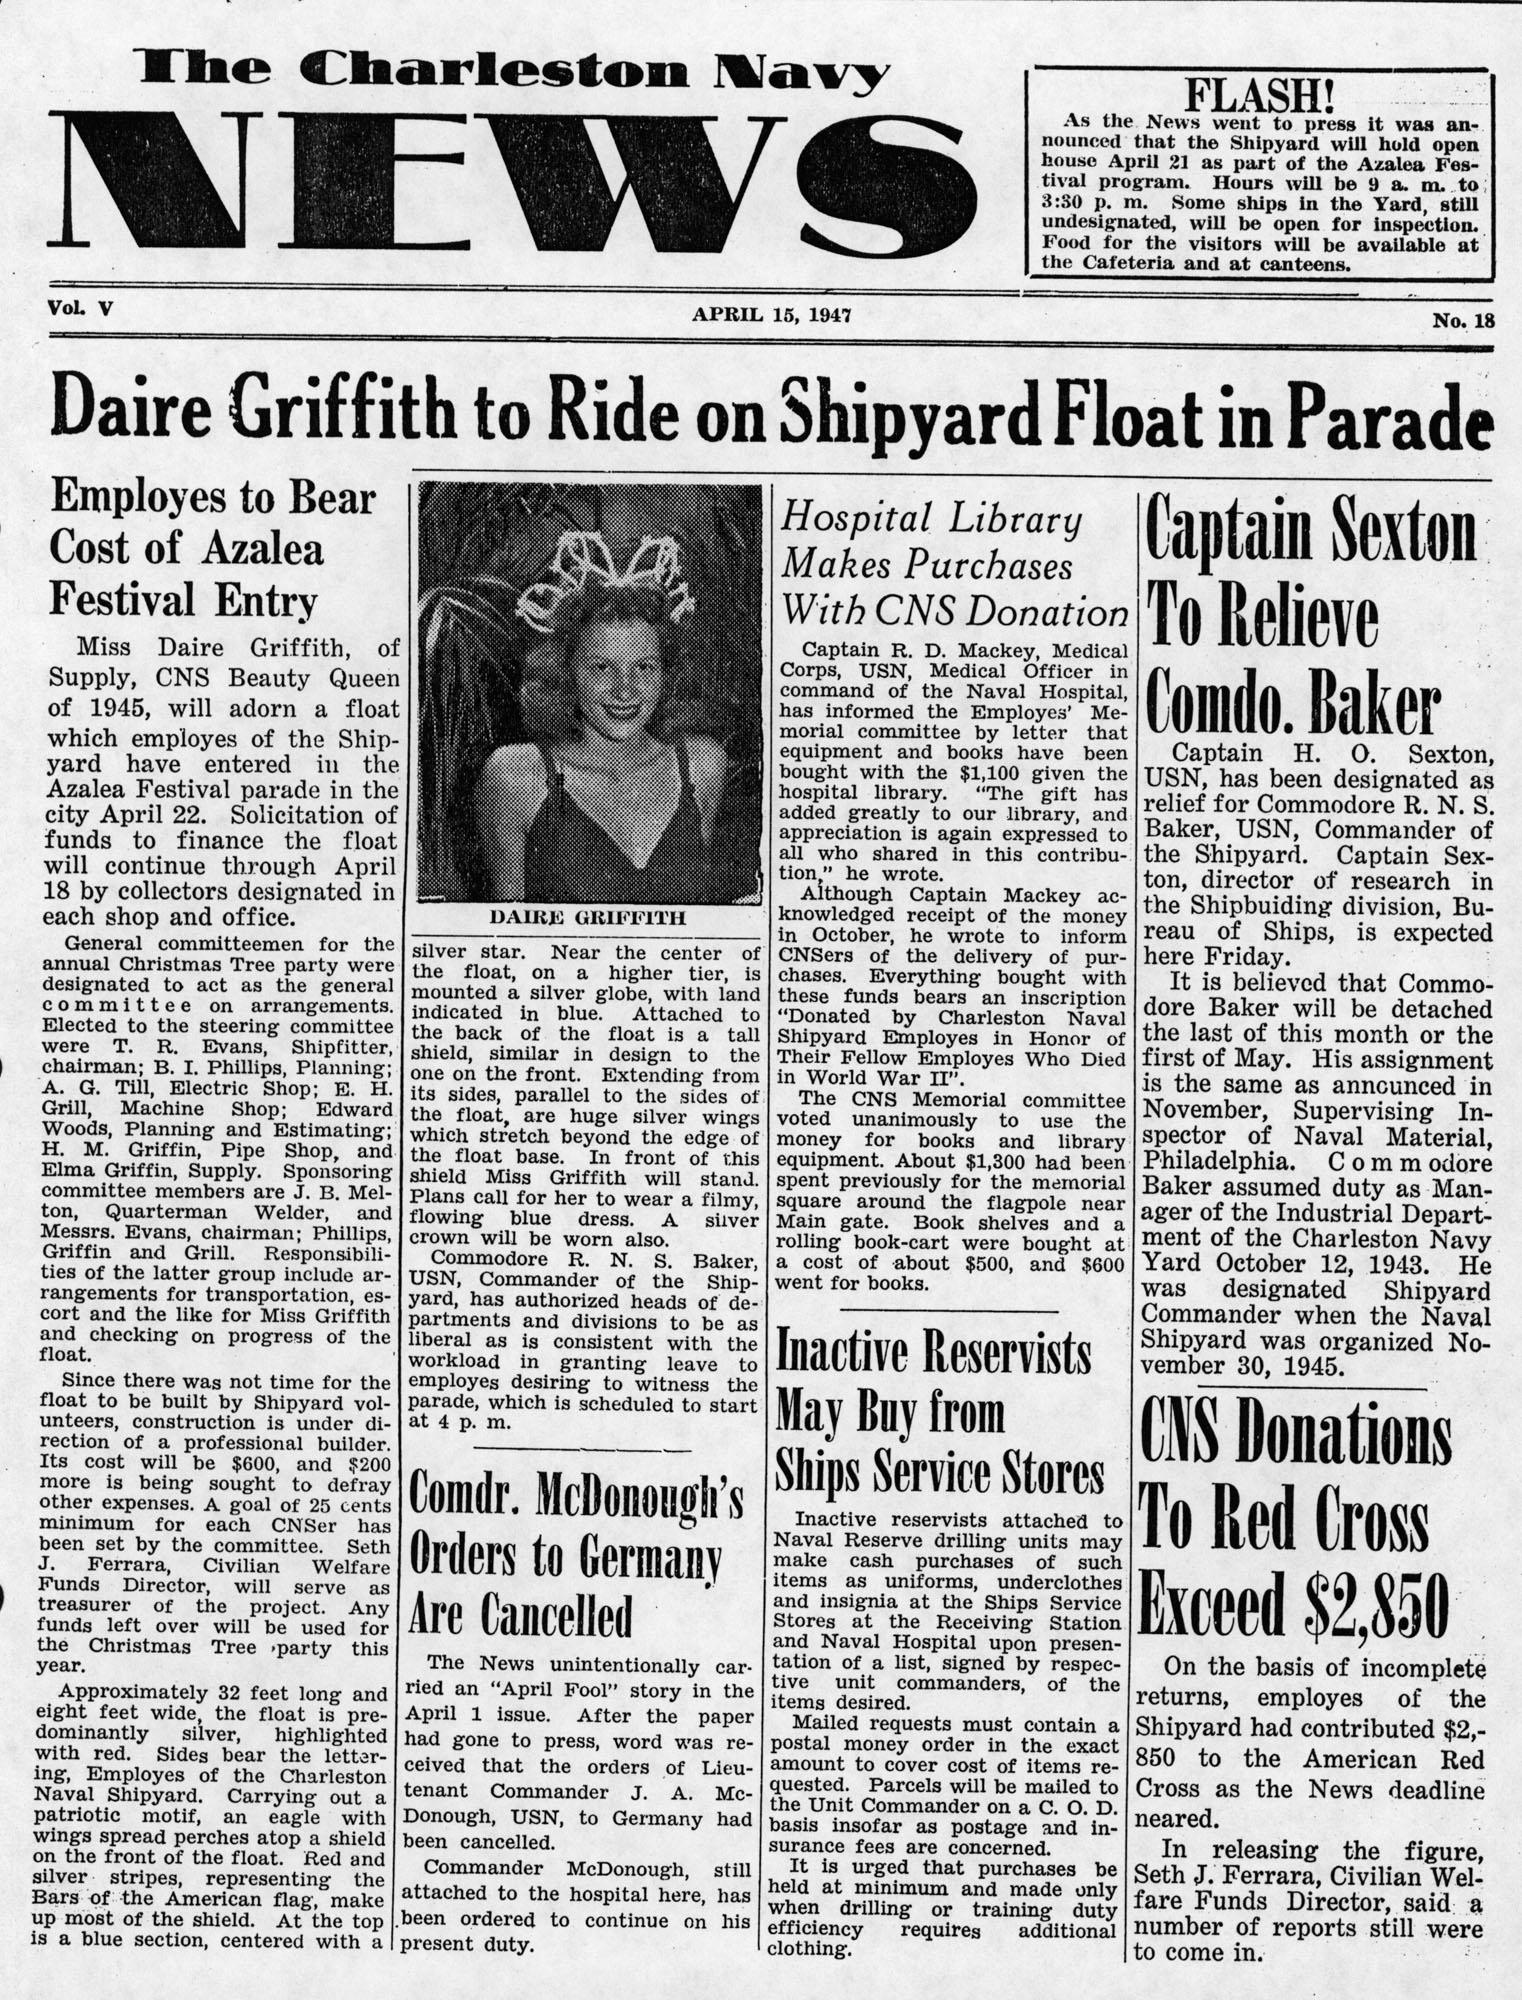 The Charleston Navy News, Volume 5, Edition 18, page i